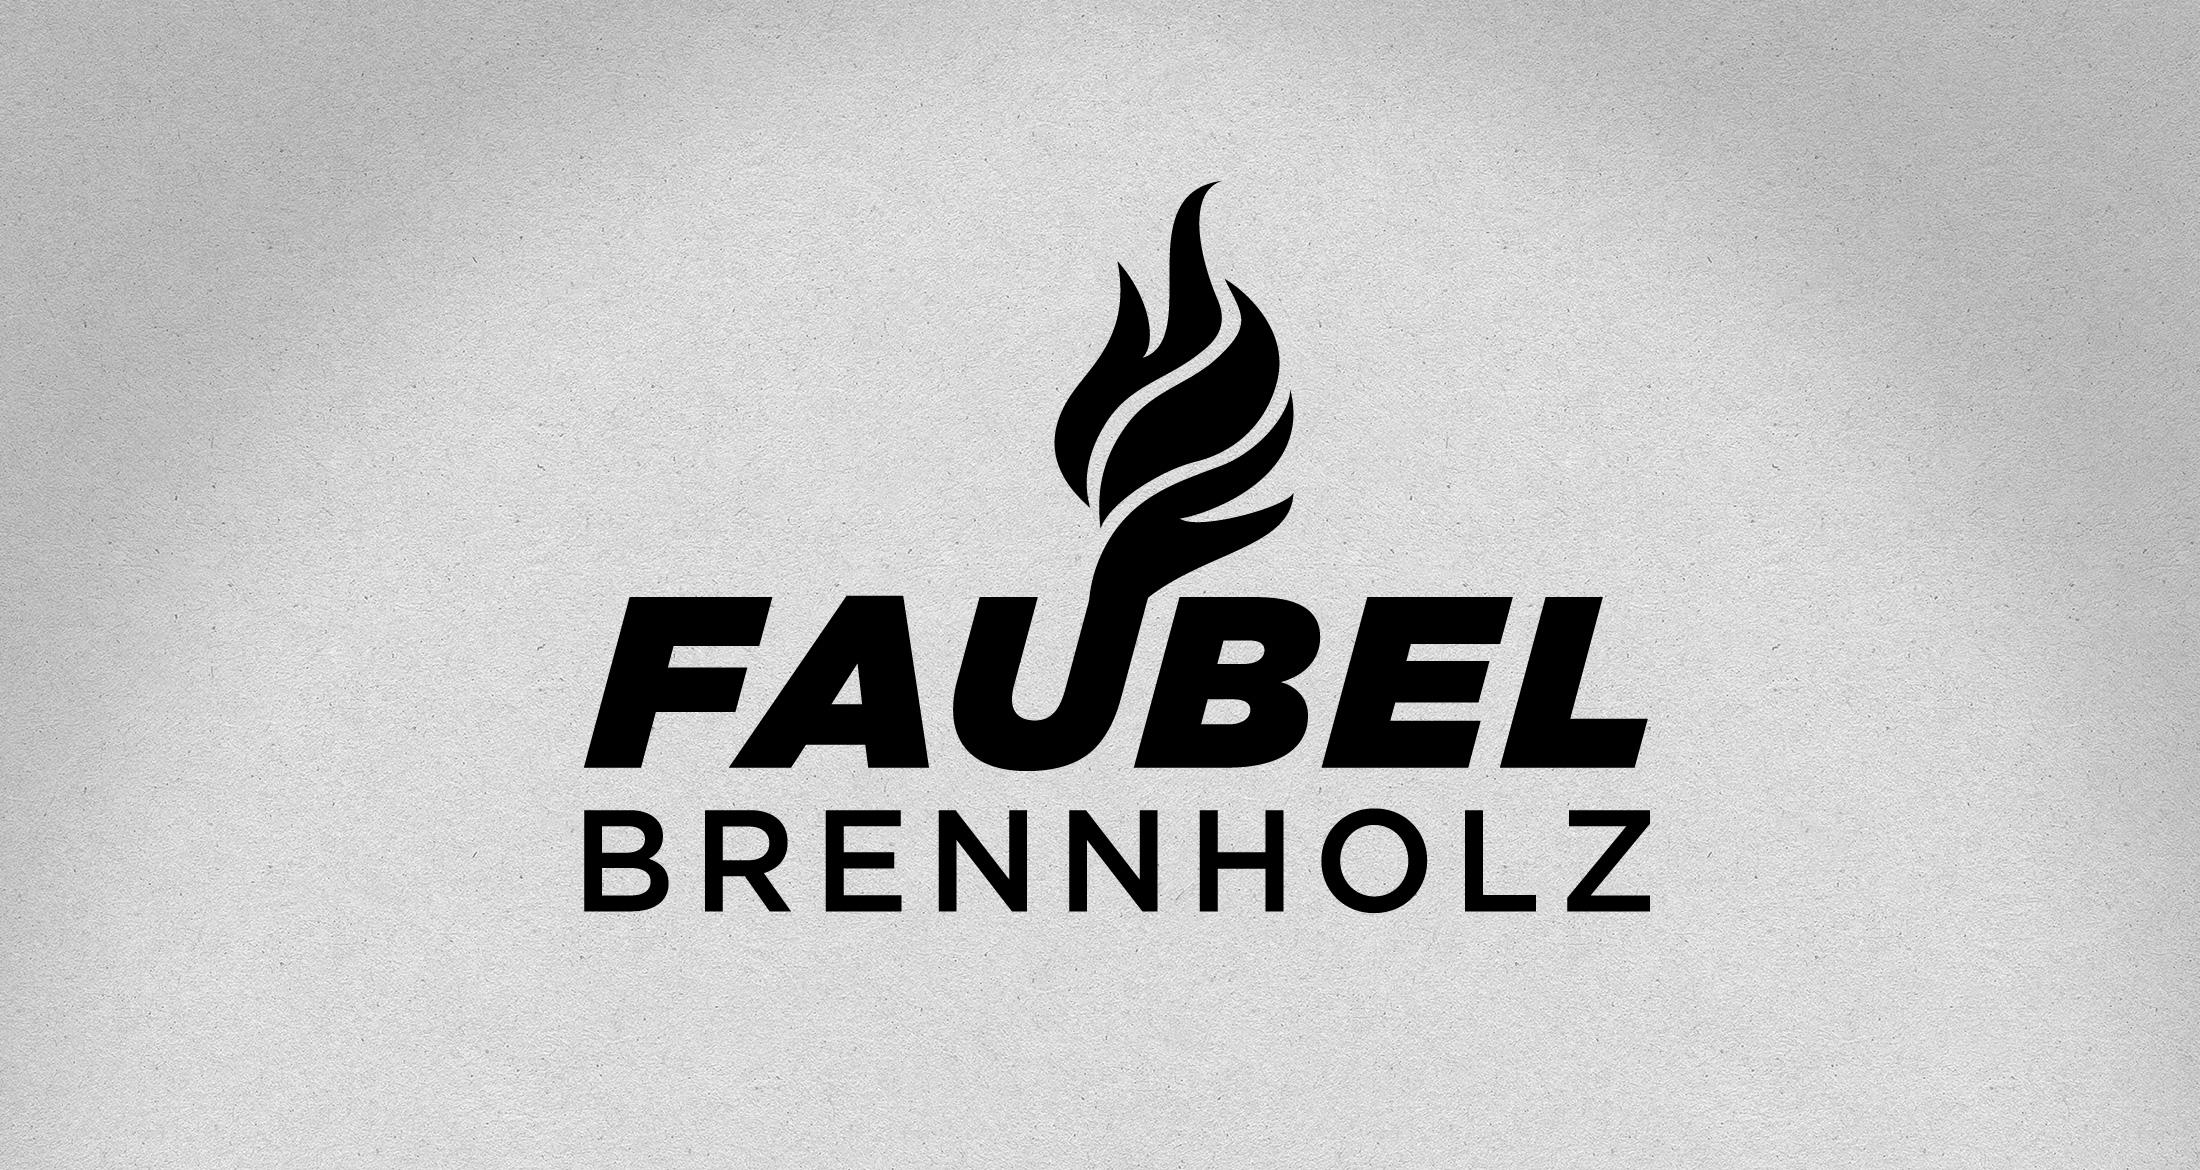 Logo Brennholzhandel, Mörsfeld, 1-farbig schwarz